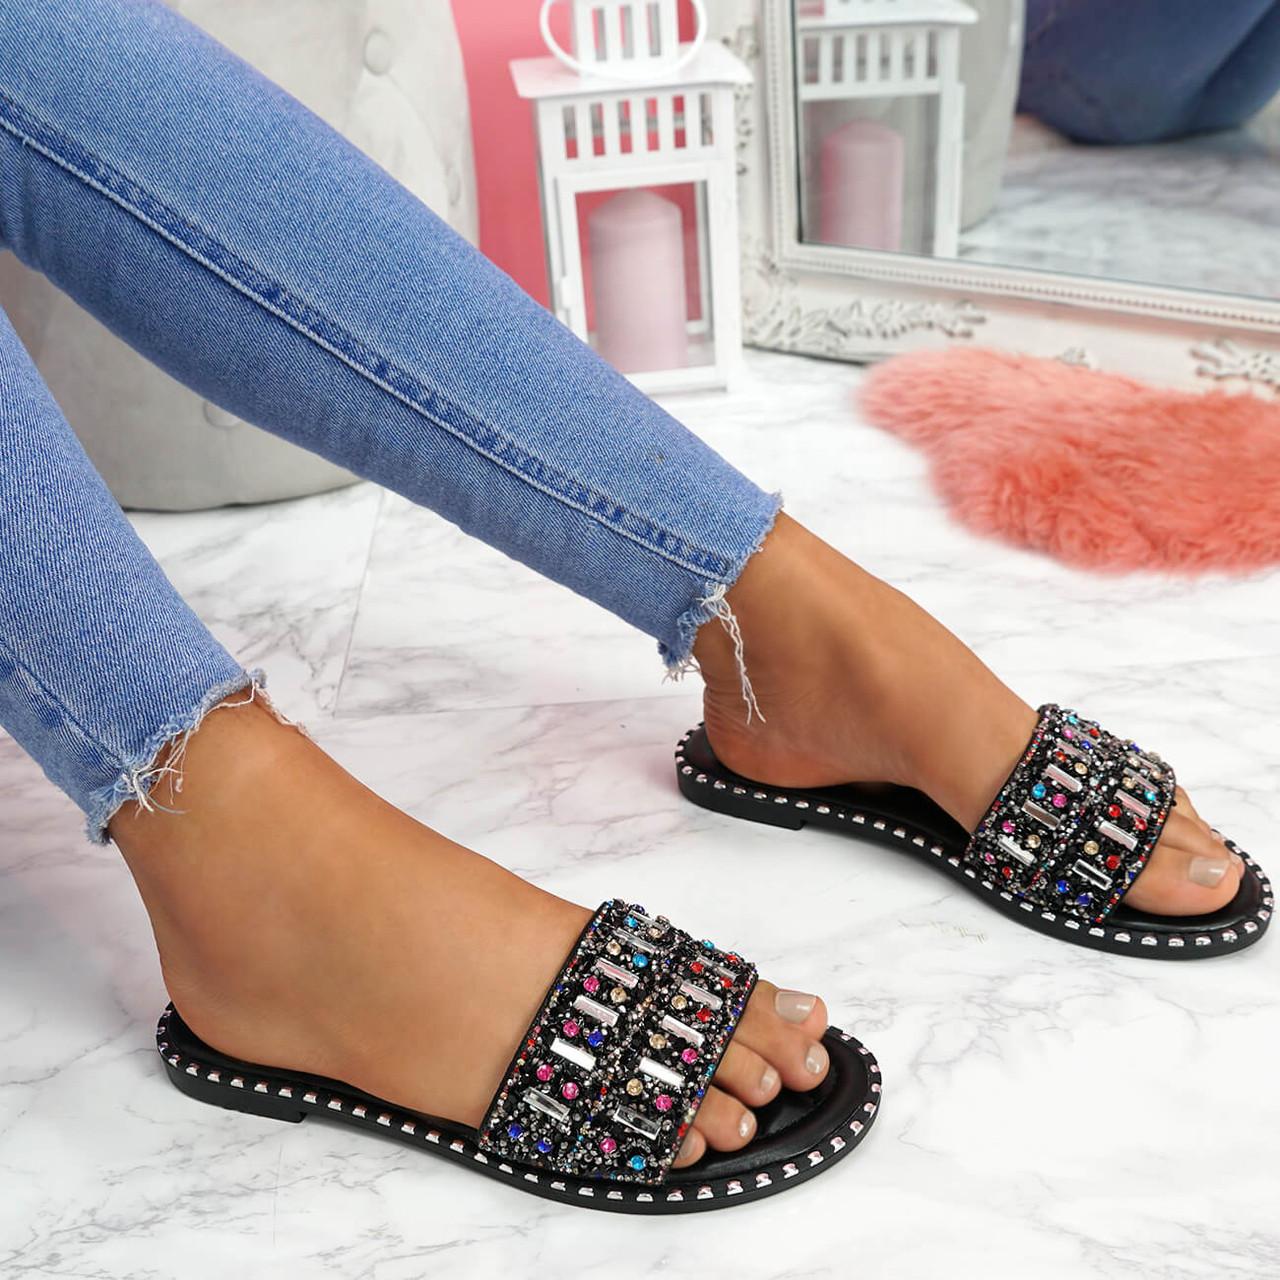 Geby Black Glitter Studded Sandals